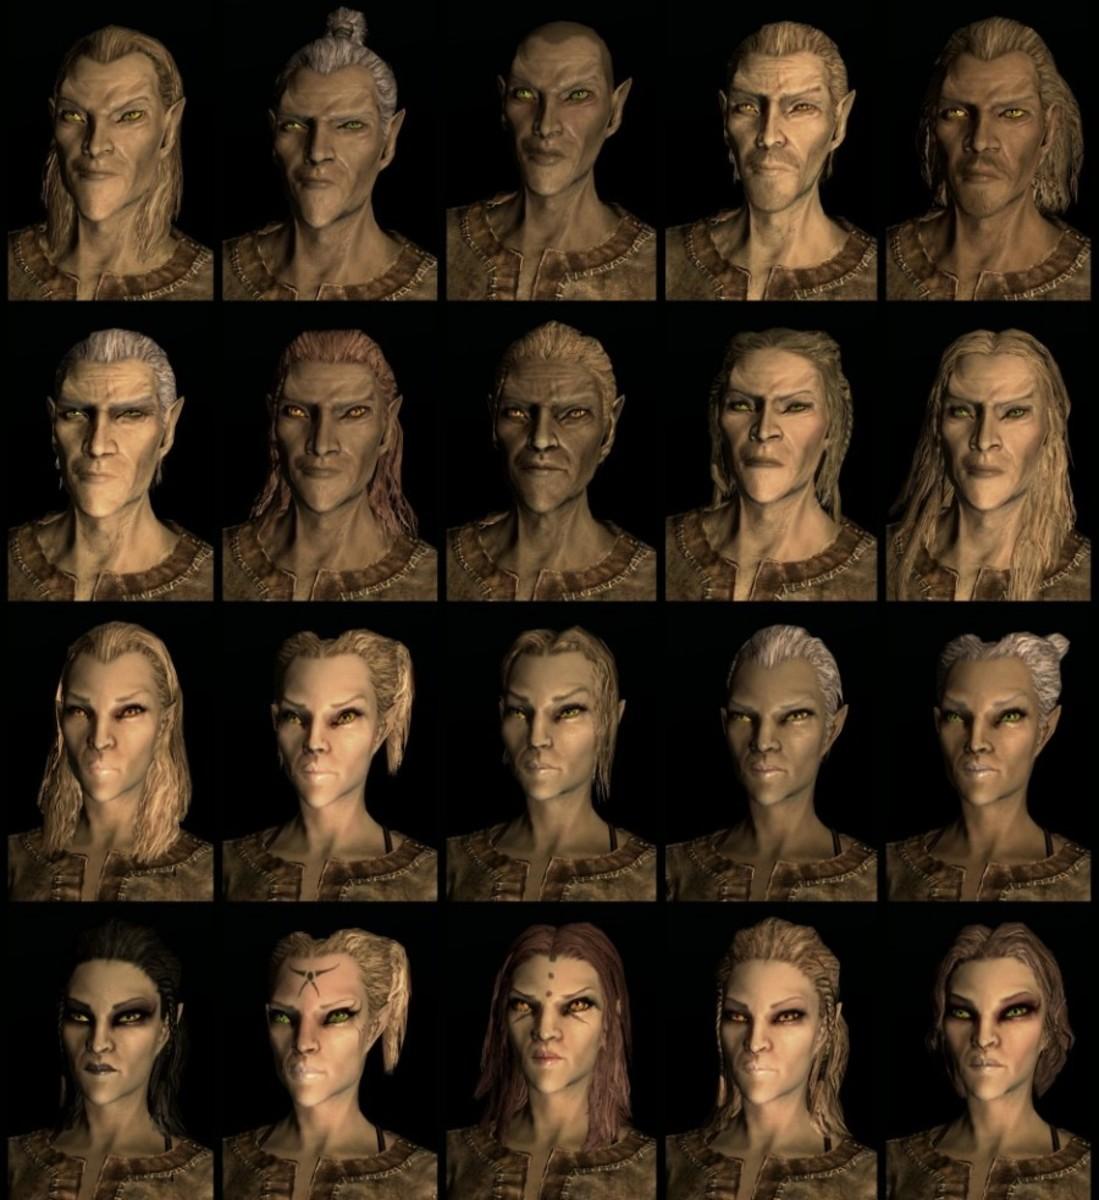 Compilation of Skyrim High Elf faces